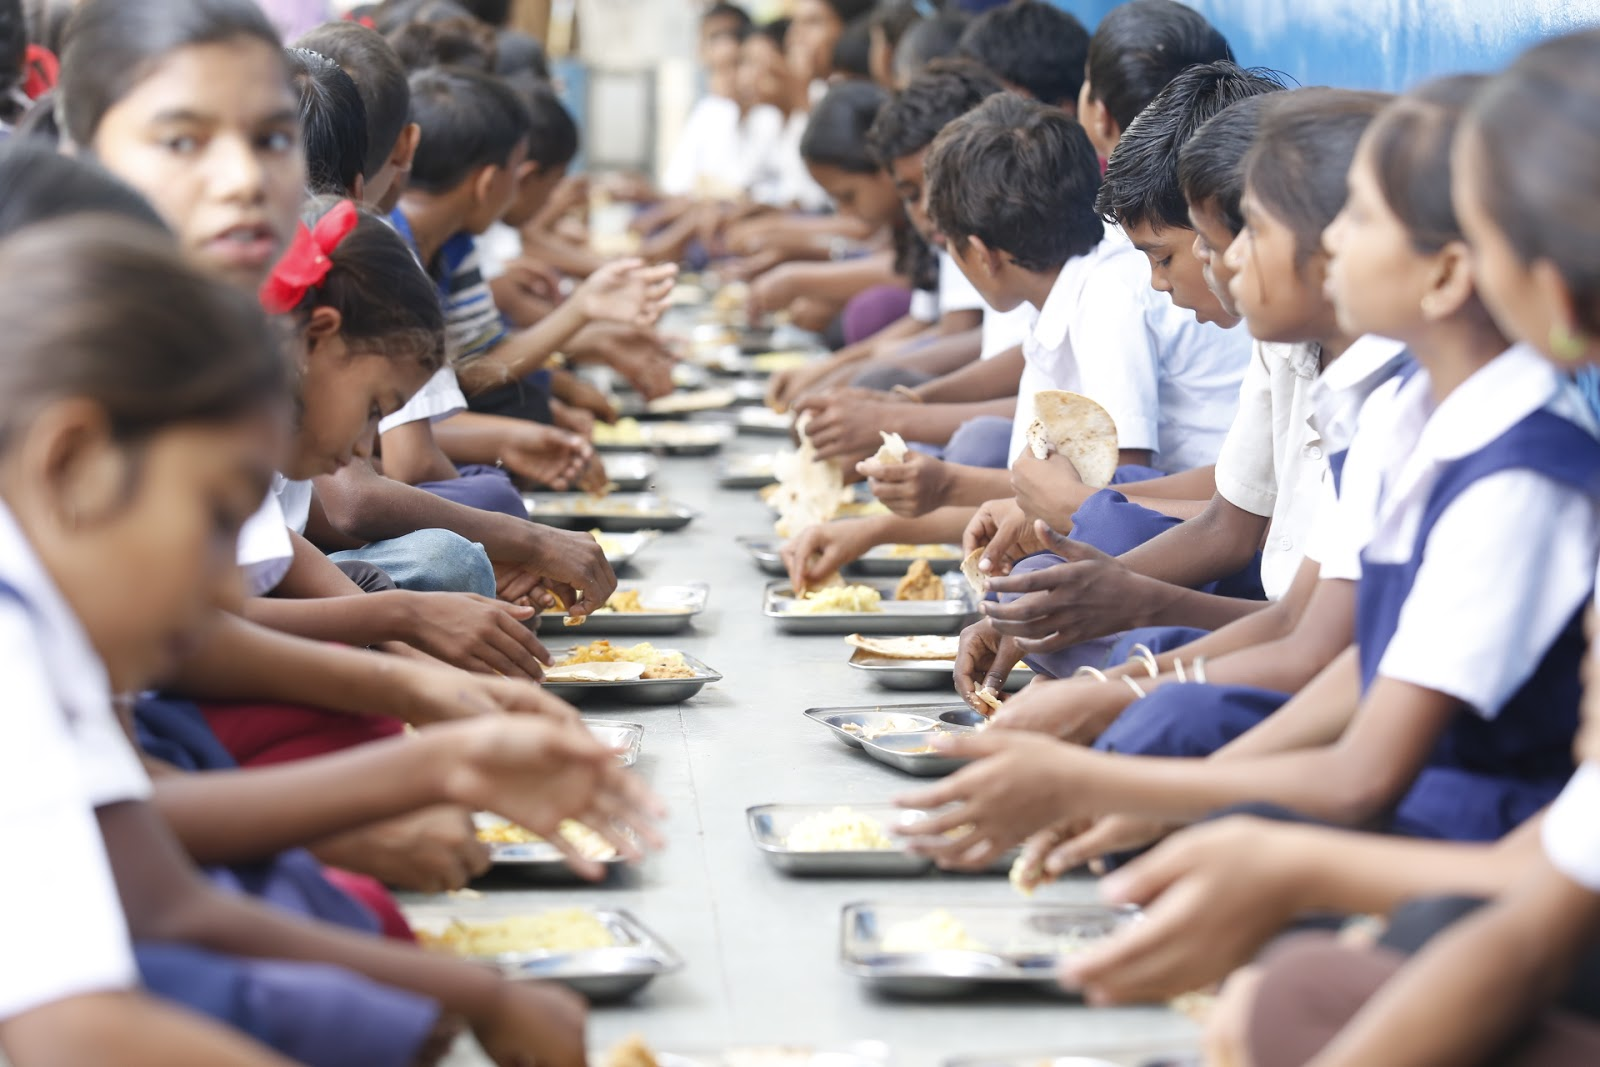 The mid-day meal program by Akshaya Patra